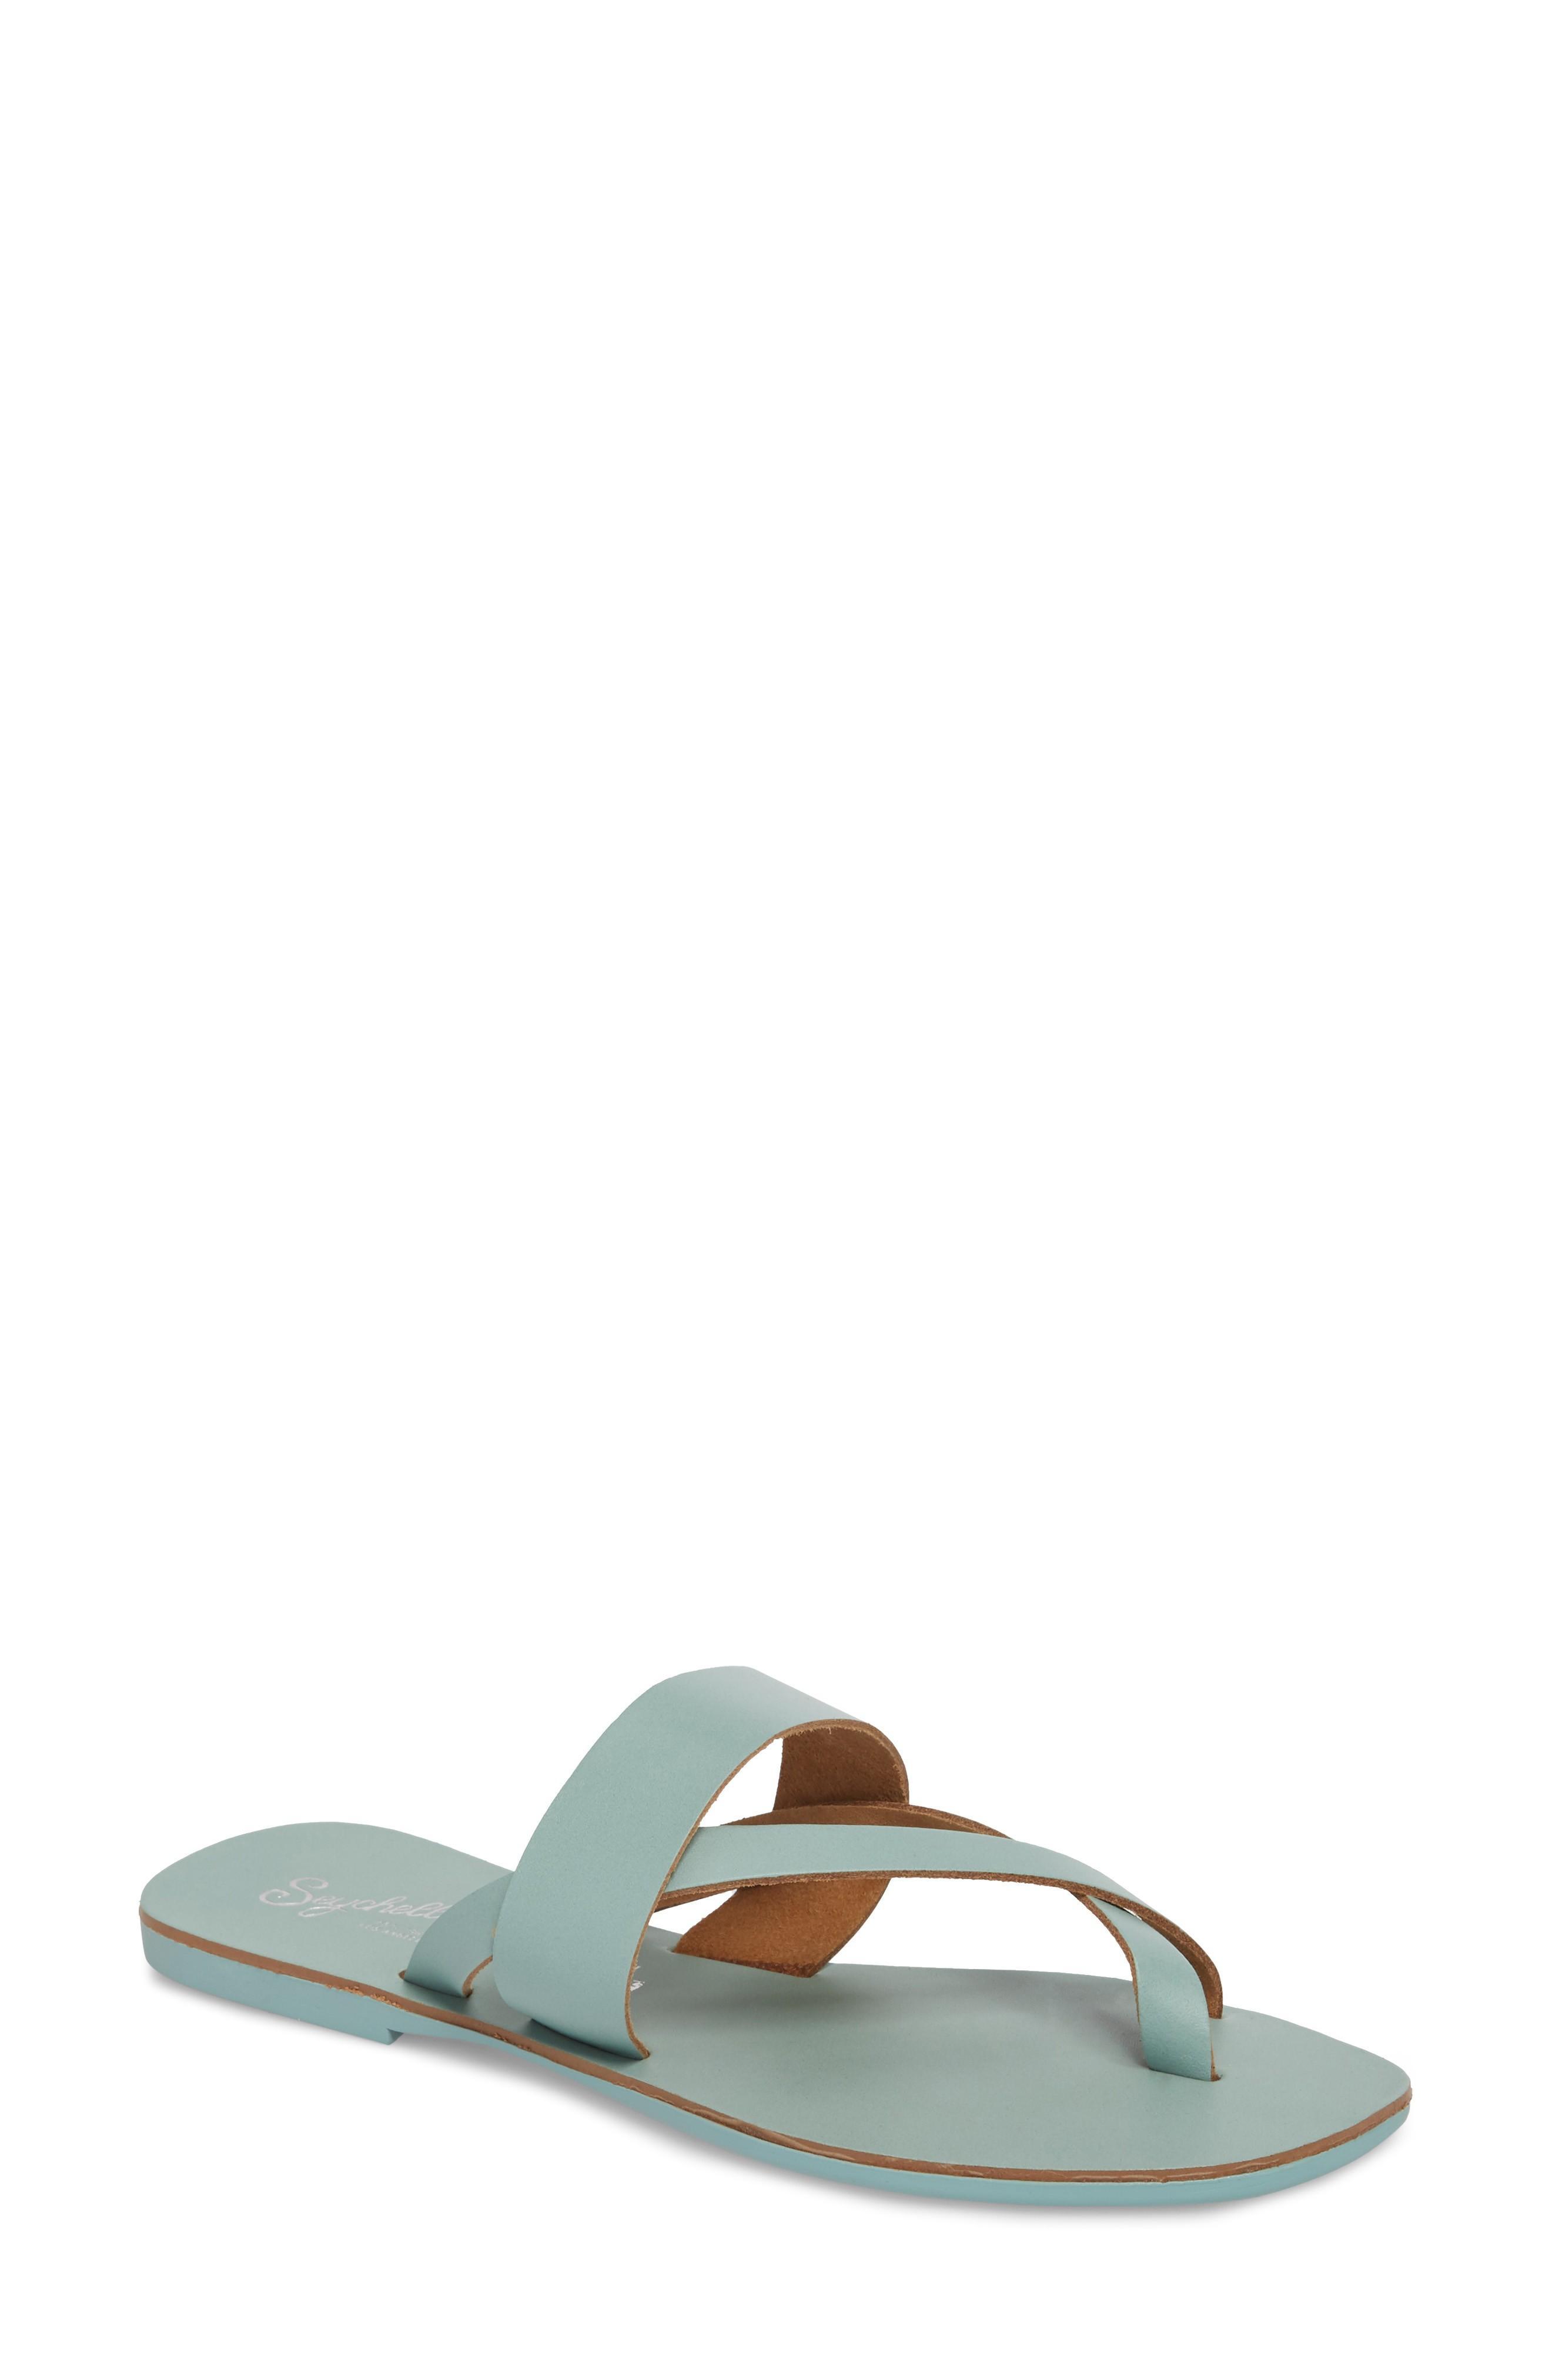 685e14d1f Seychelles Destiny Thong Sandal In Seafoam Leather